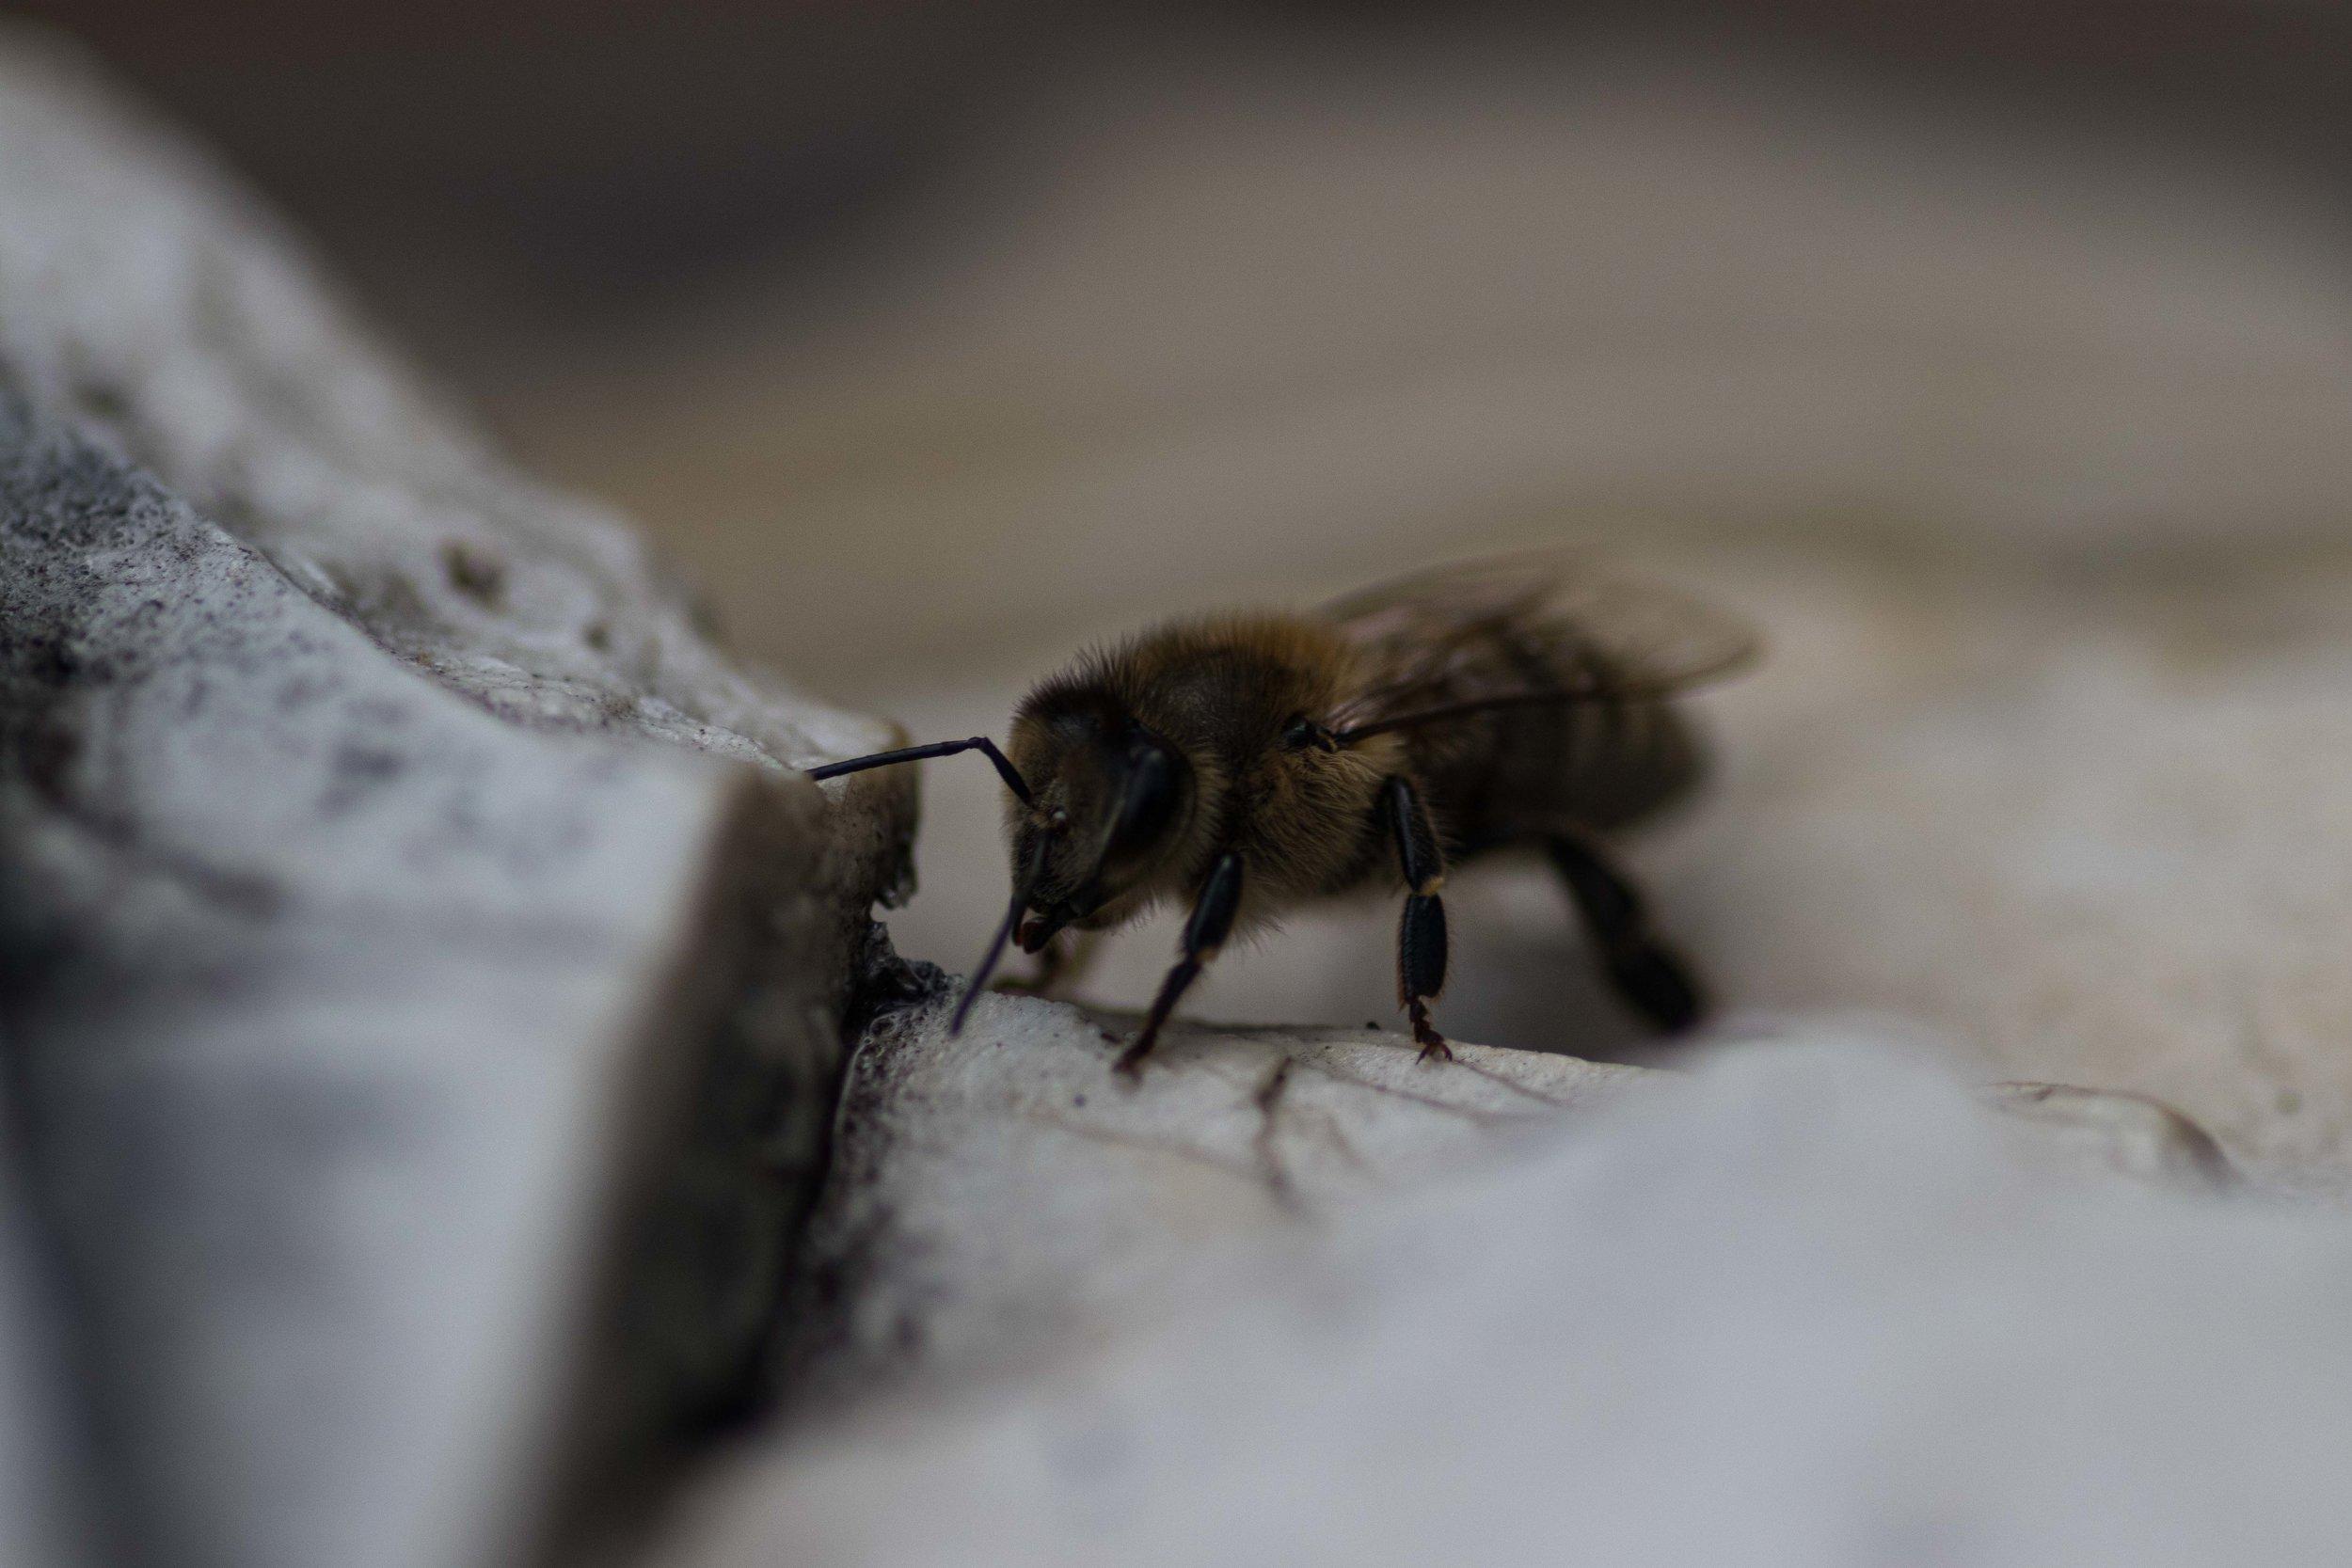 The Neighbour's Honey Bee